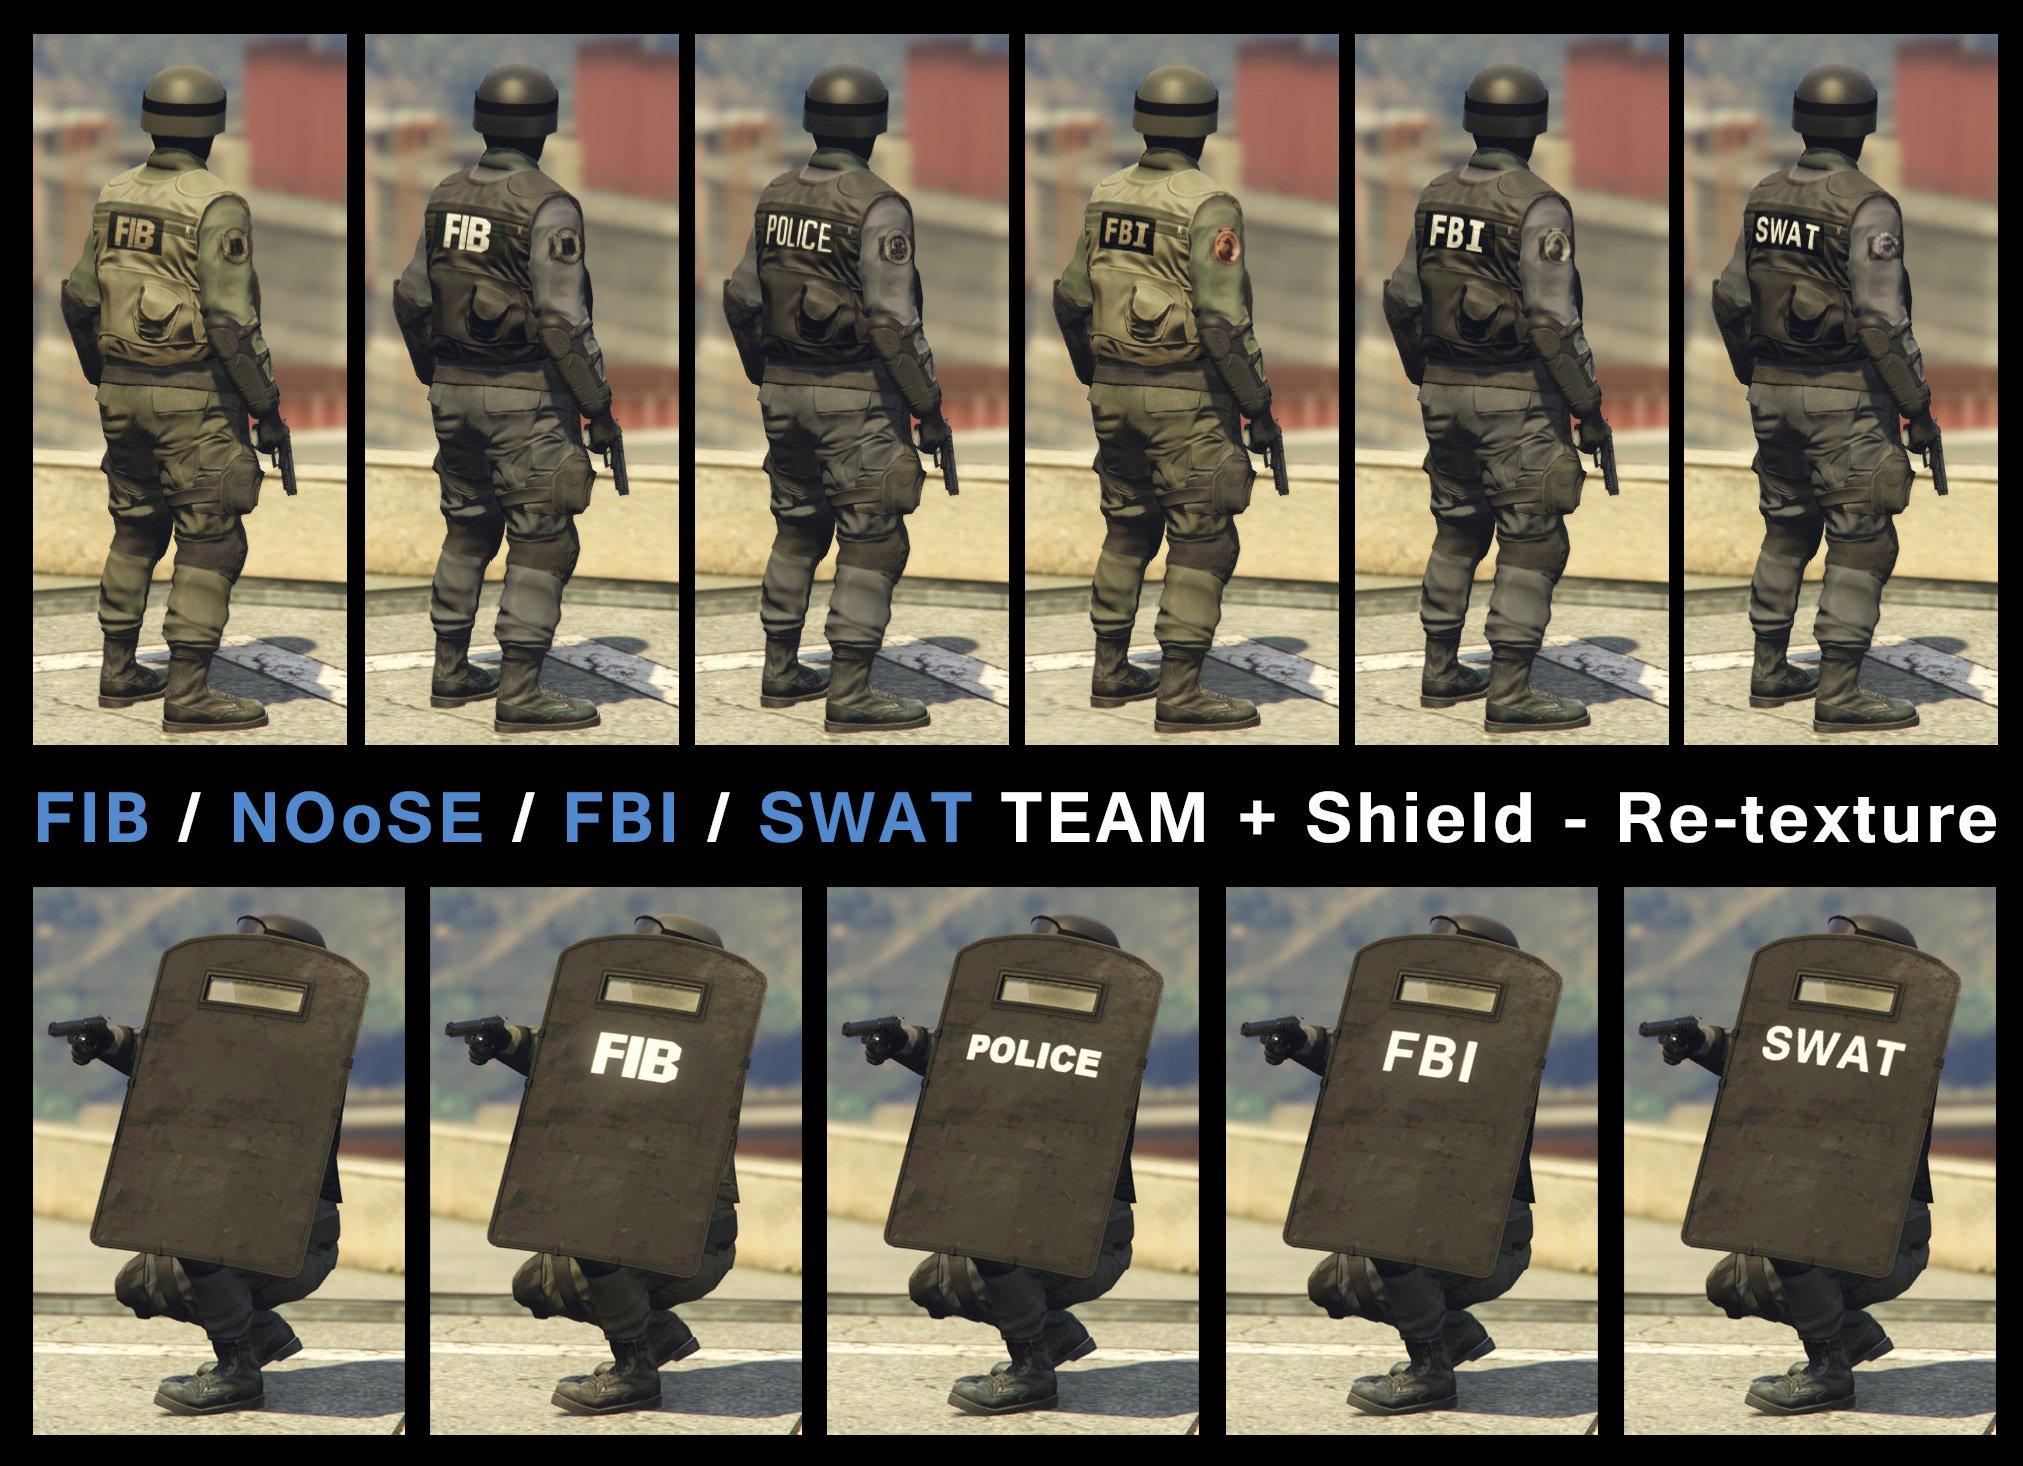 FIB / Noose / FBI / SWAT Team Textures